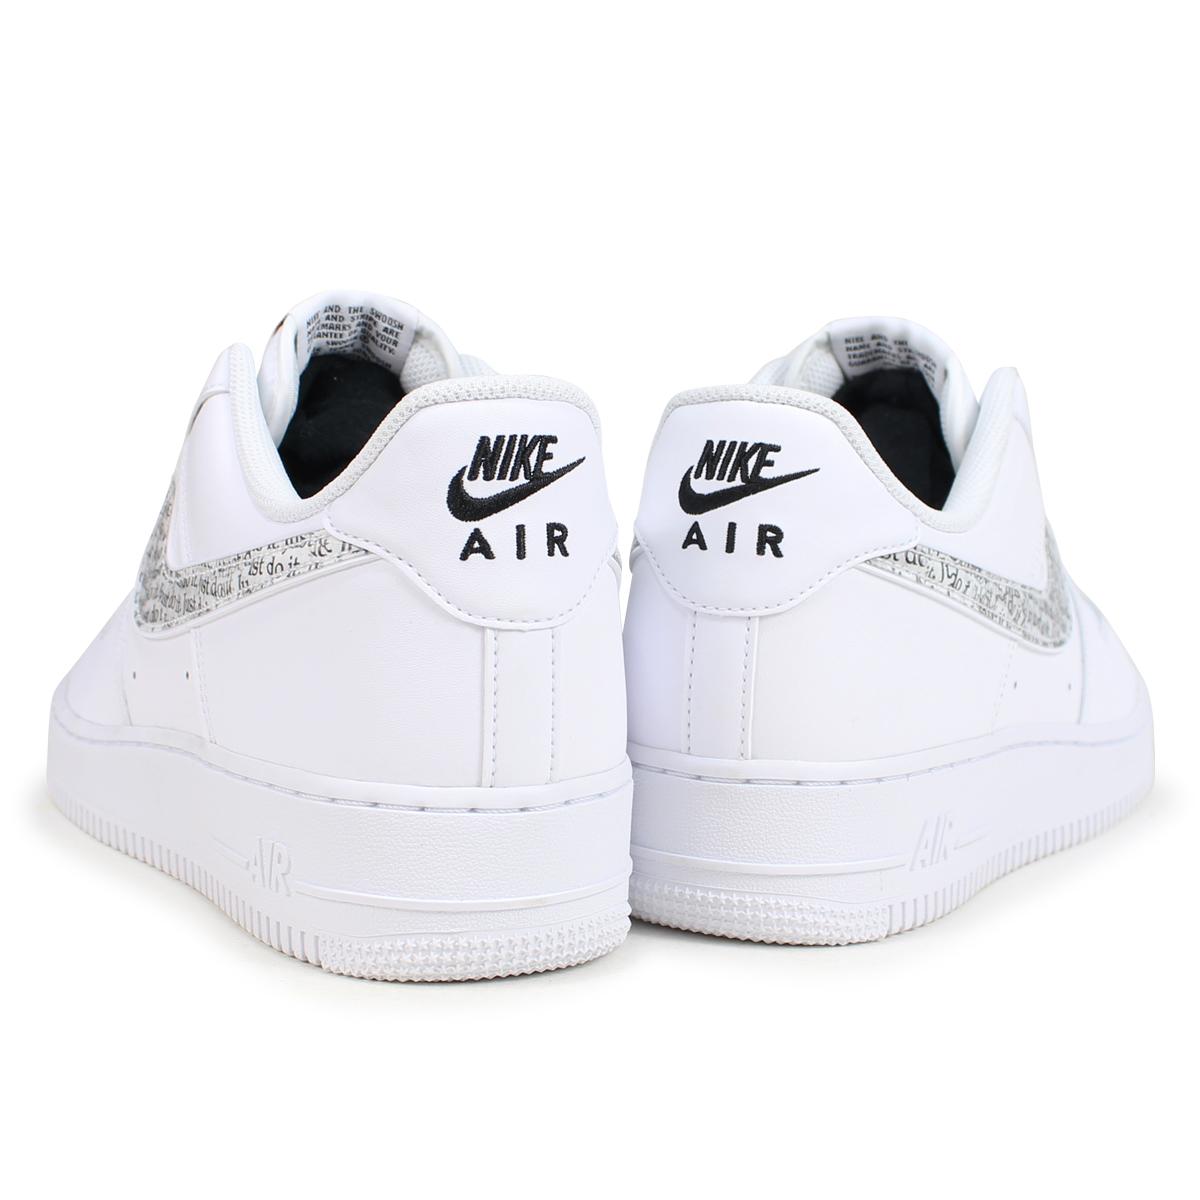 NIKE AIR FORCE 1 07 LV8 JUST DO IT LNTC Nike air force 1 sneakers men BQ5361 100 white [189]